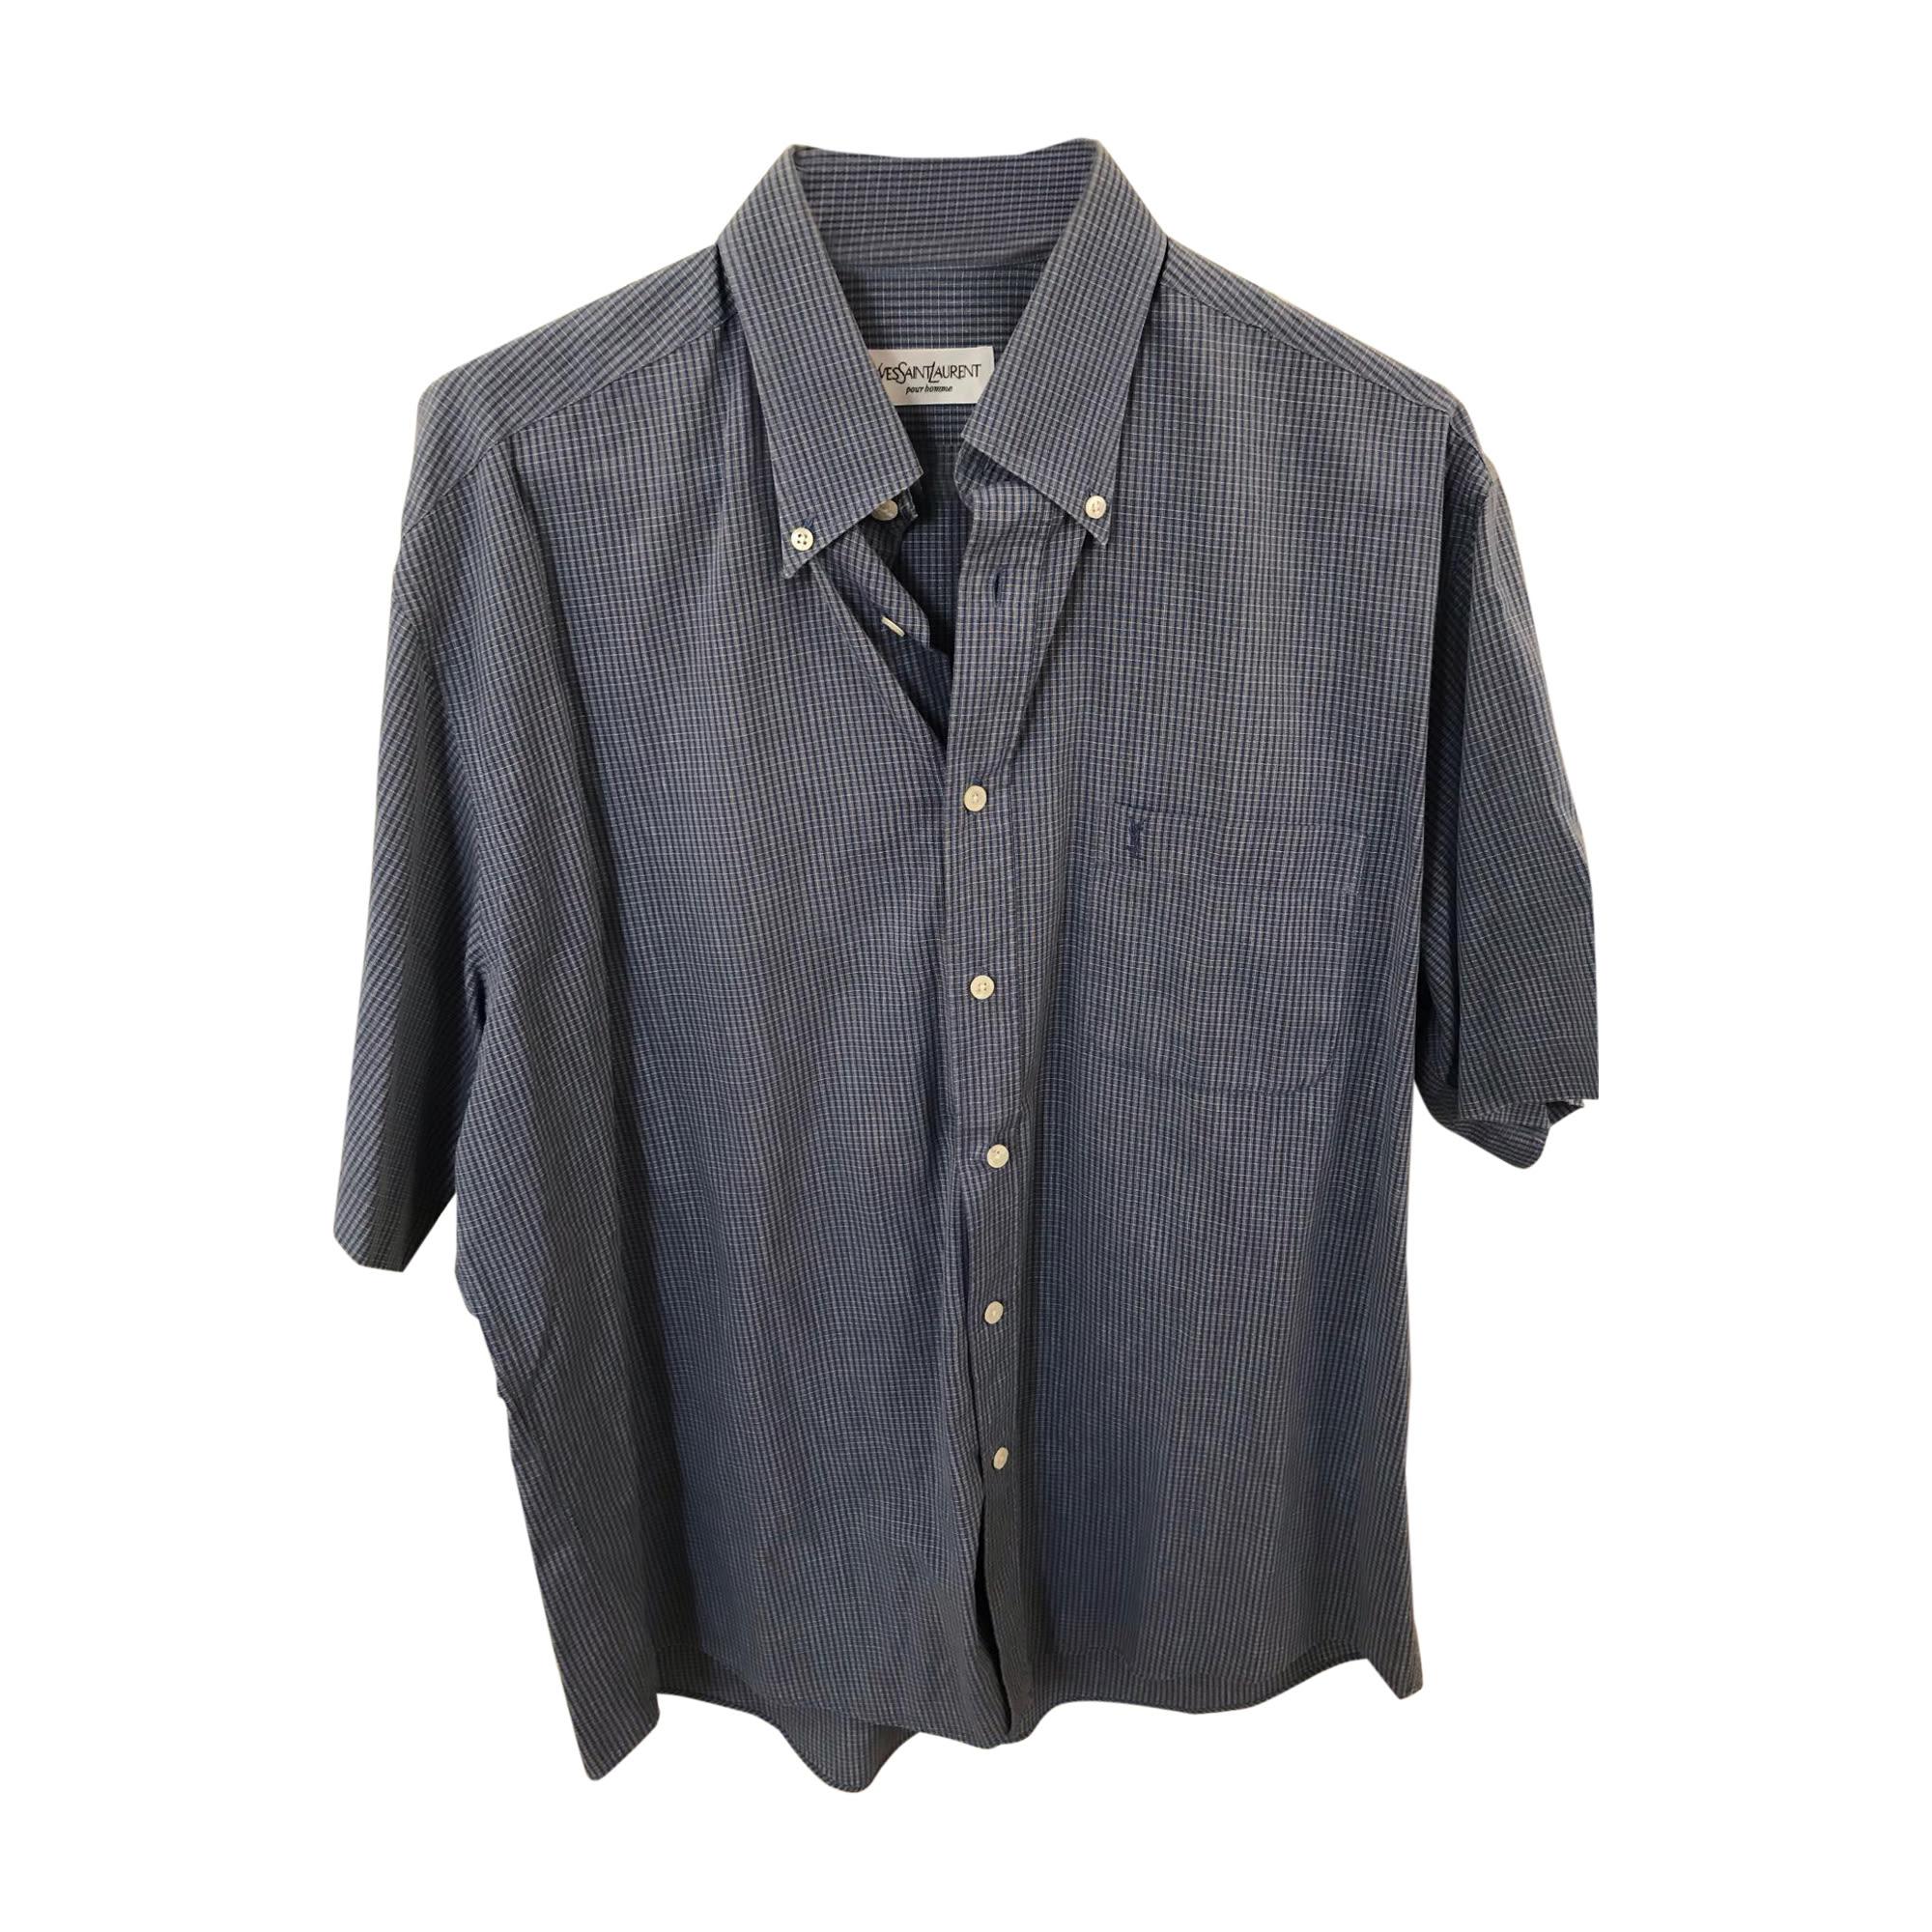 Shirt YVES SAINT LAURENT Blue, navy, turquoise